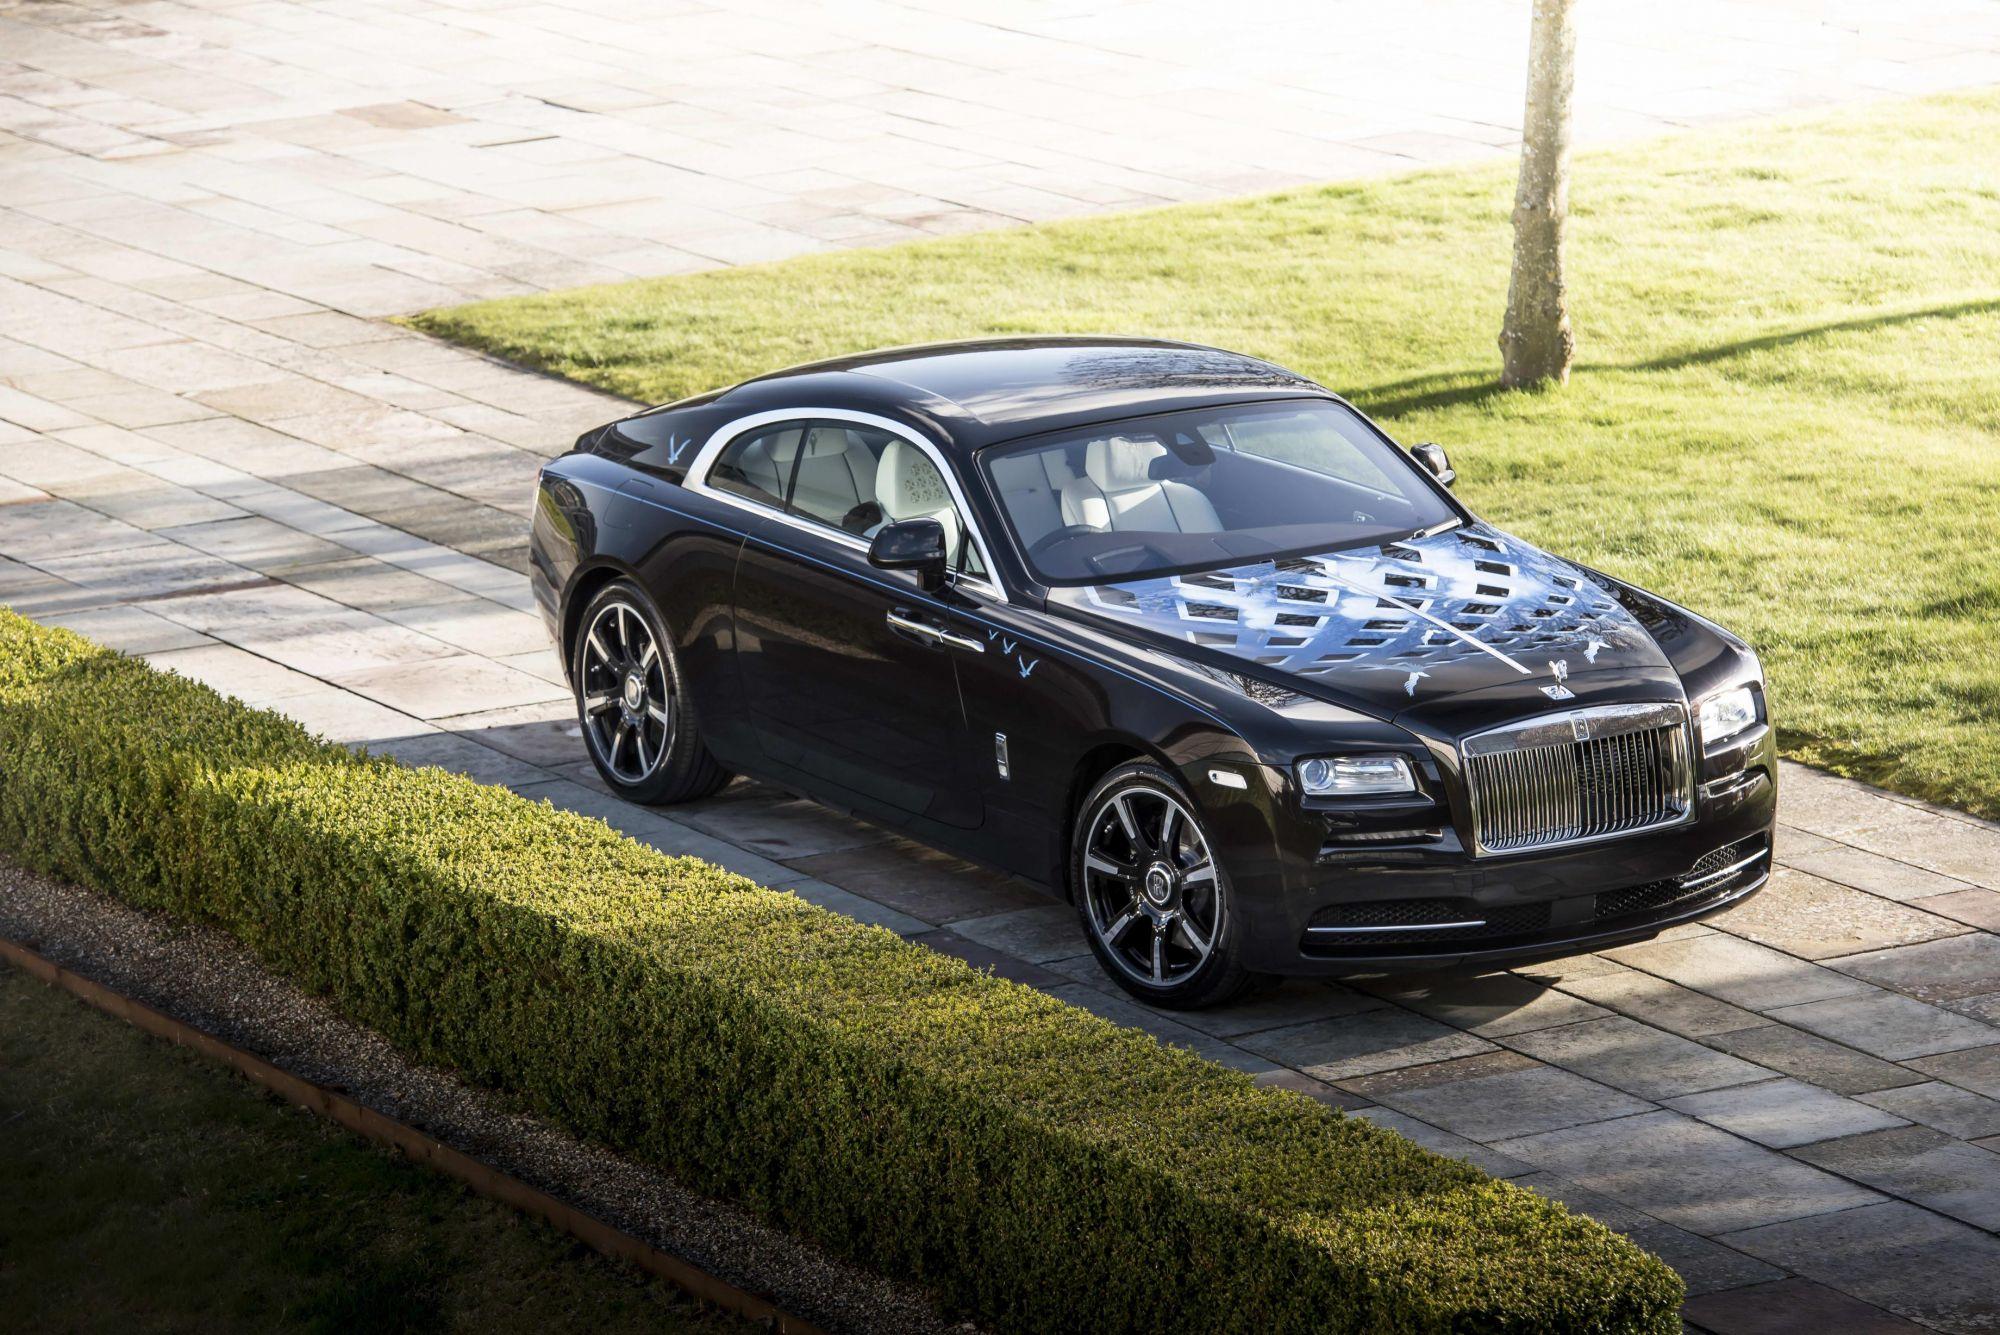 The Rolls-Royce Got Rock Legends To Design Their Car